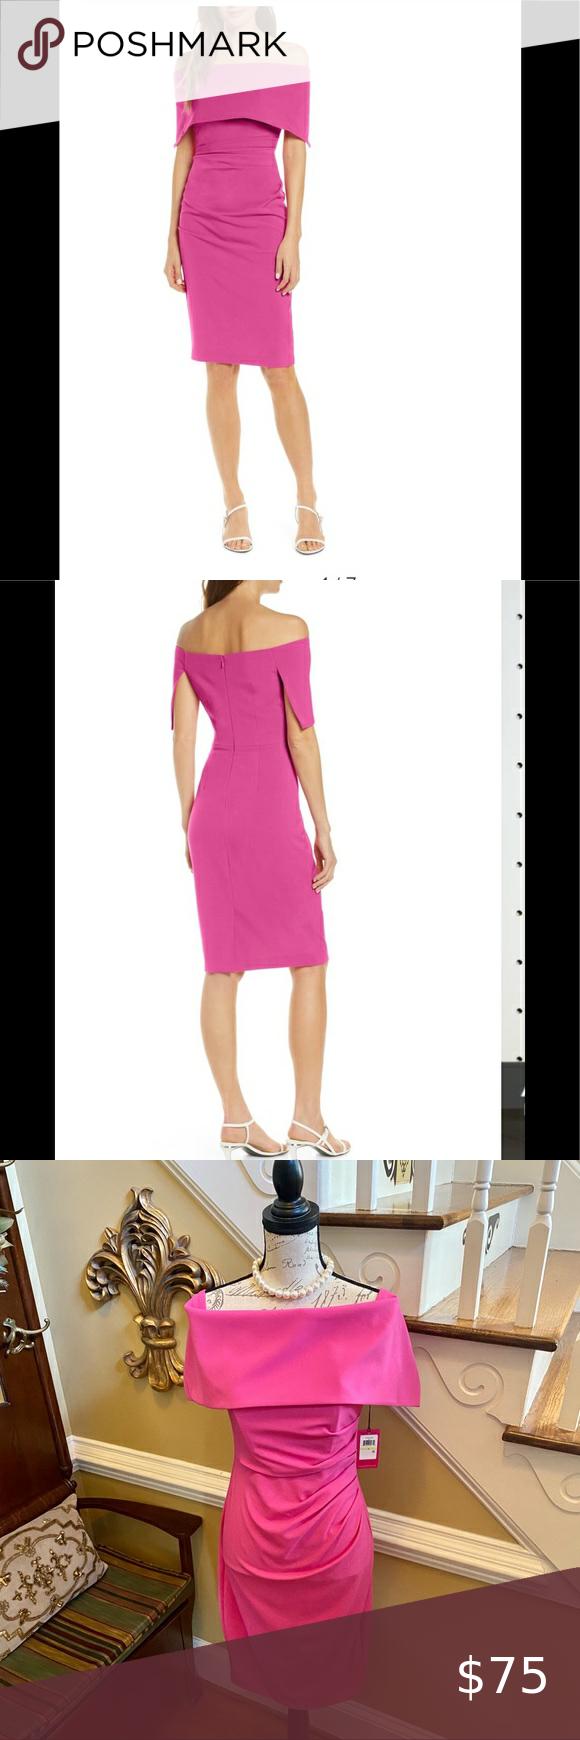 Vince Camuto Strapless Popover Cocktail Dress Dresses Cocktail Dress Clothes Design [ 1740 x 580 Pixel ]